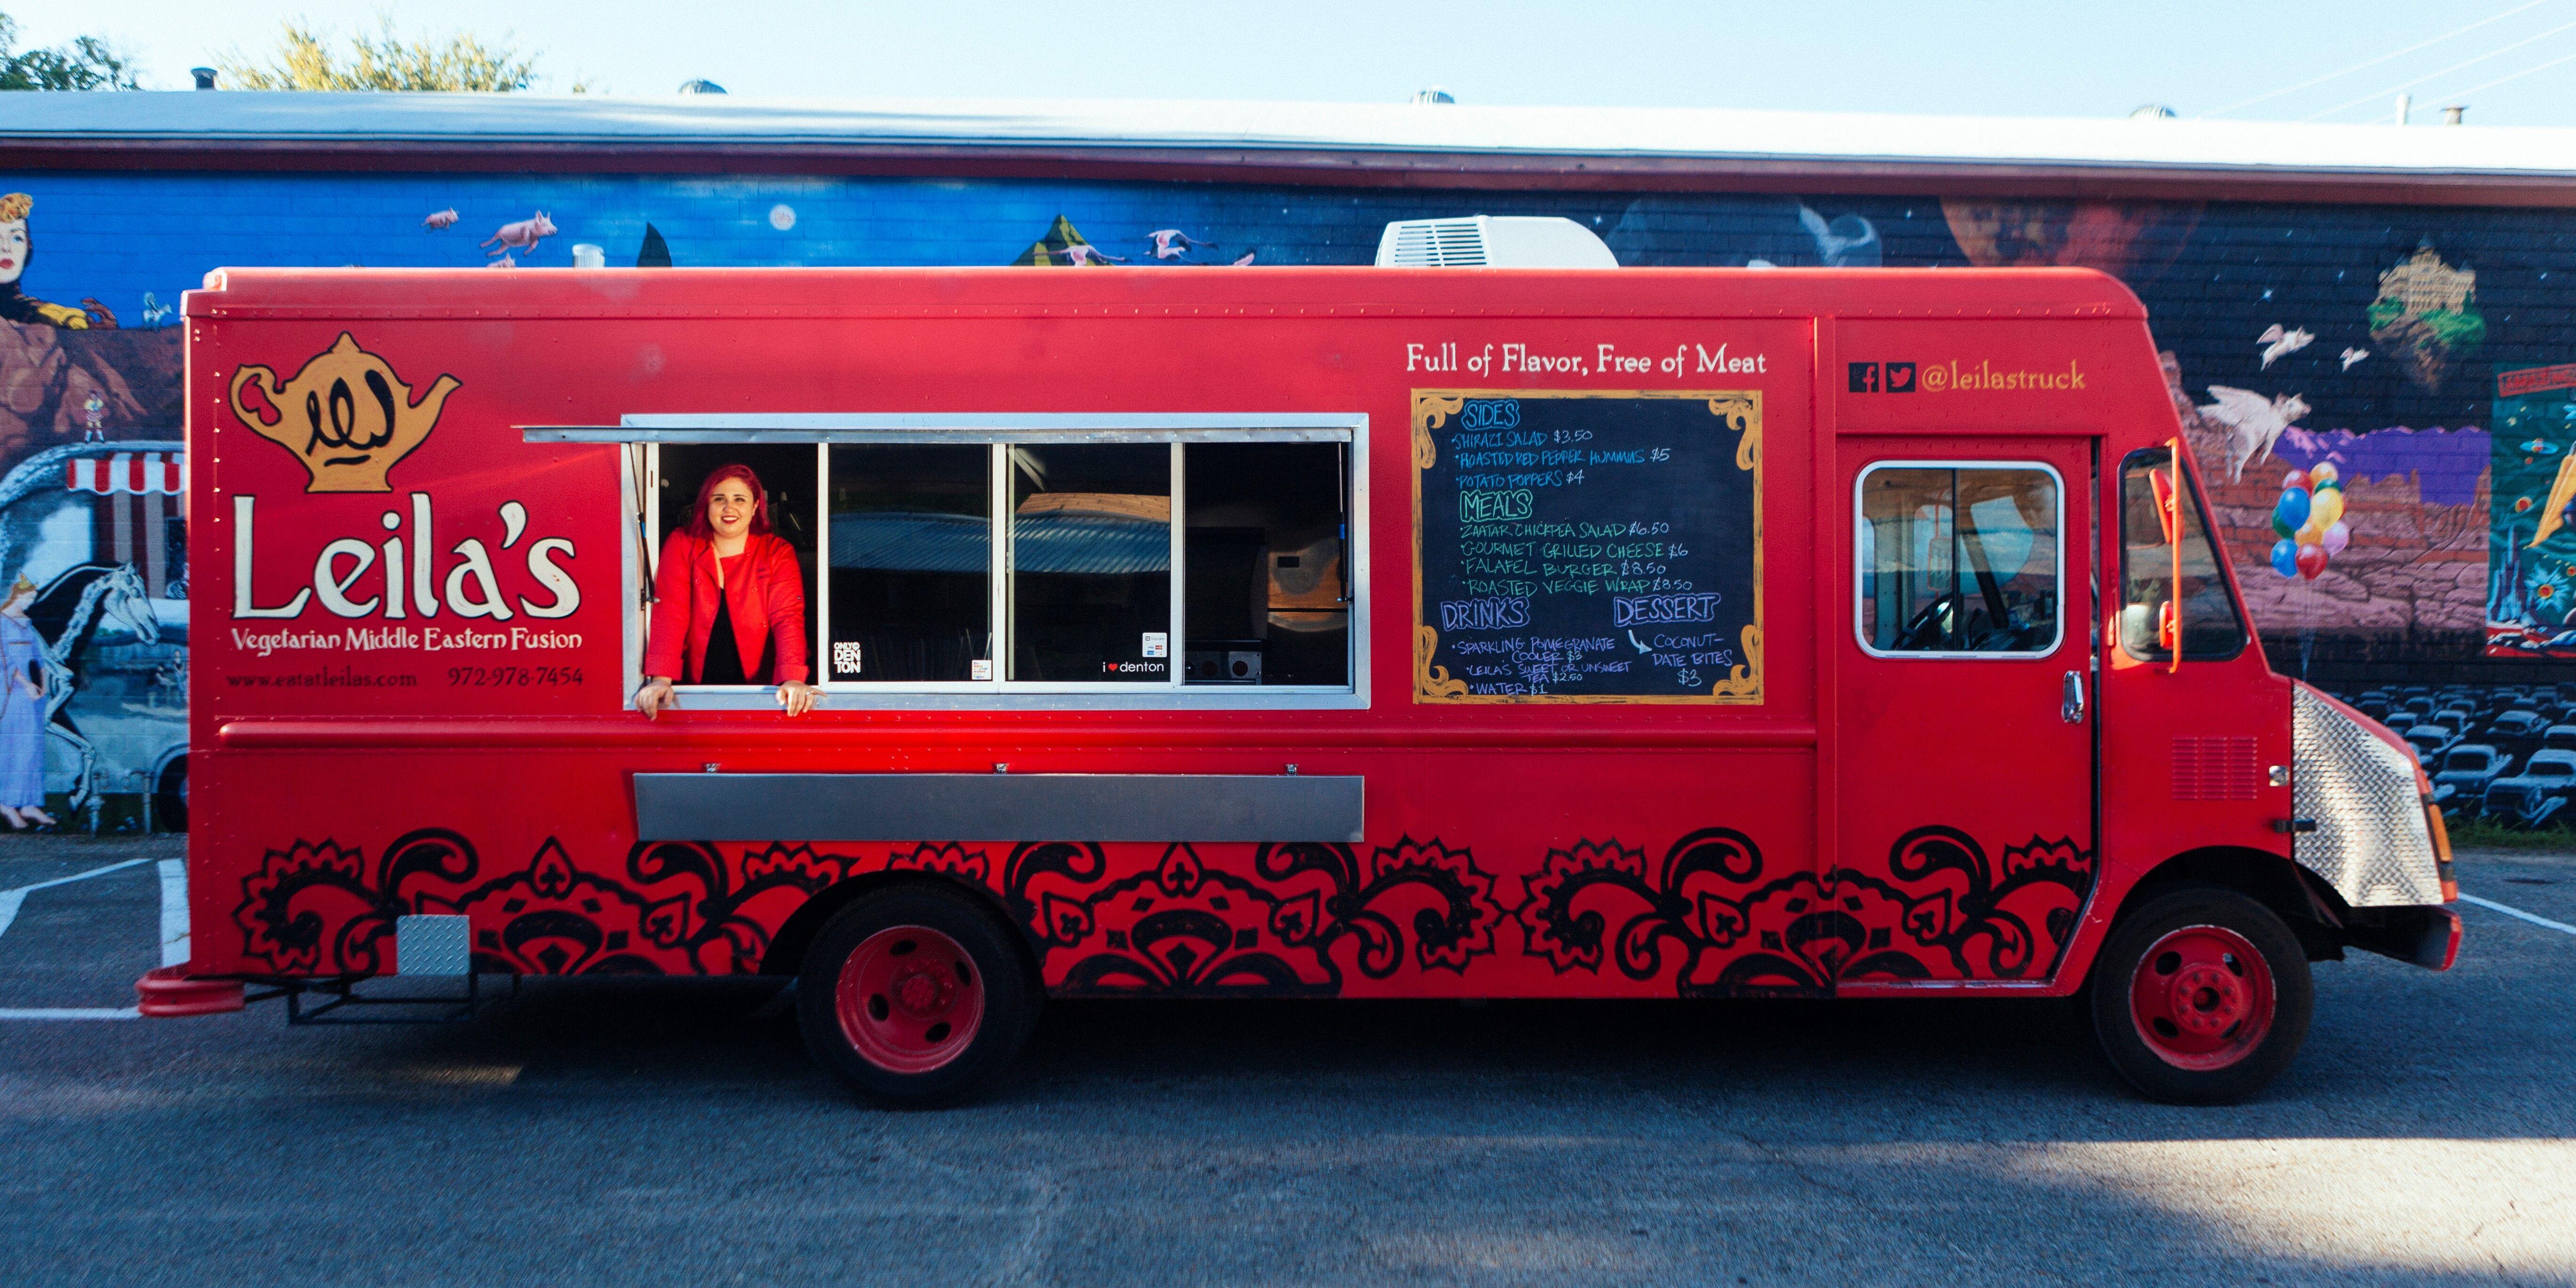 Leila's Food Truck